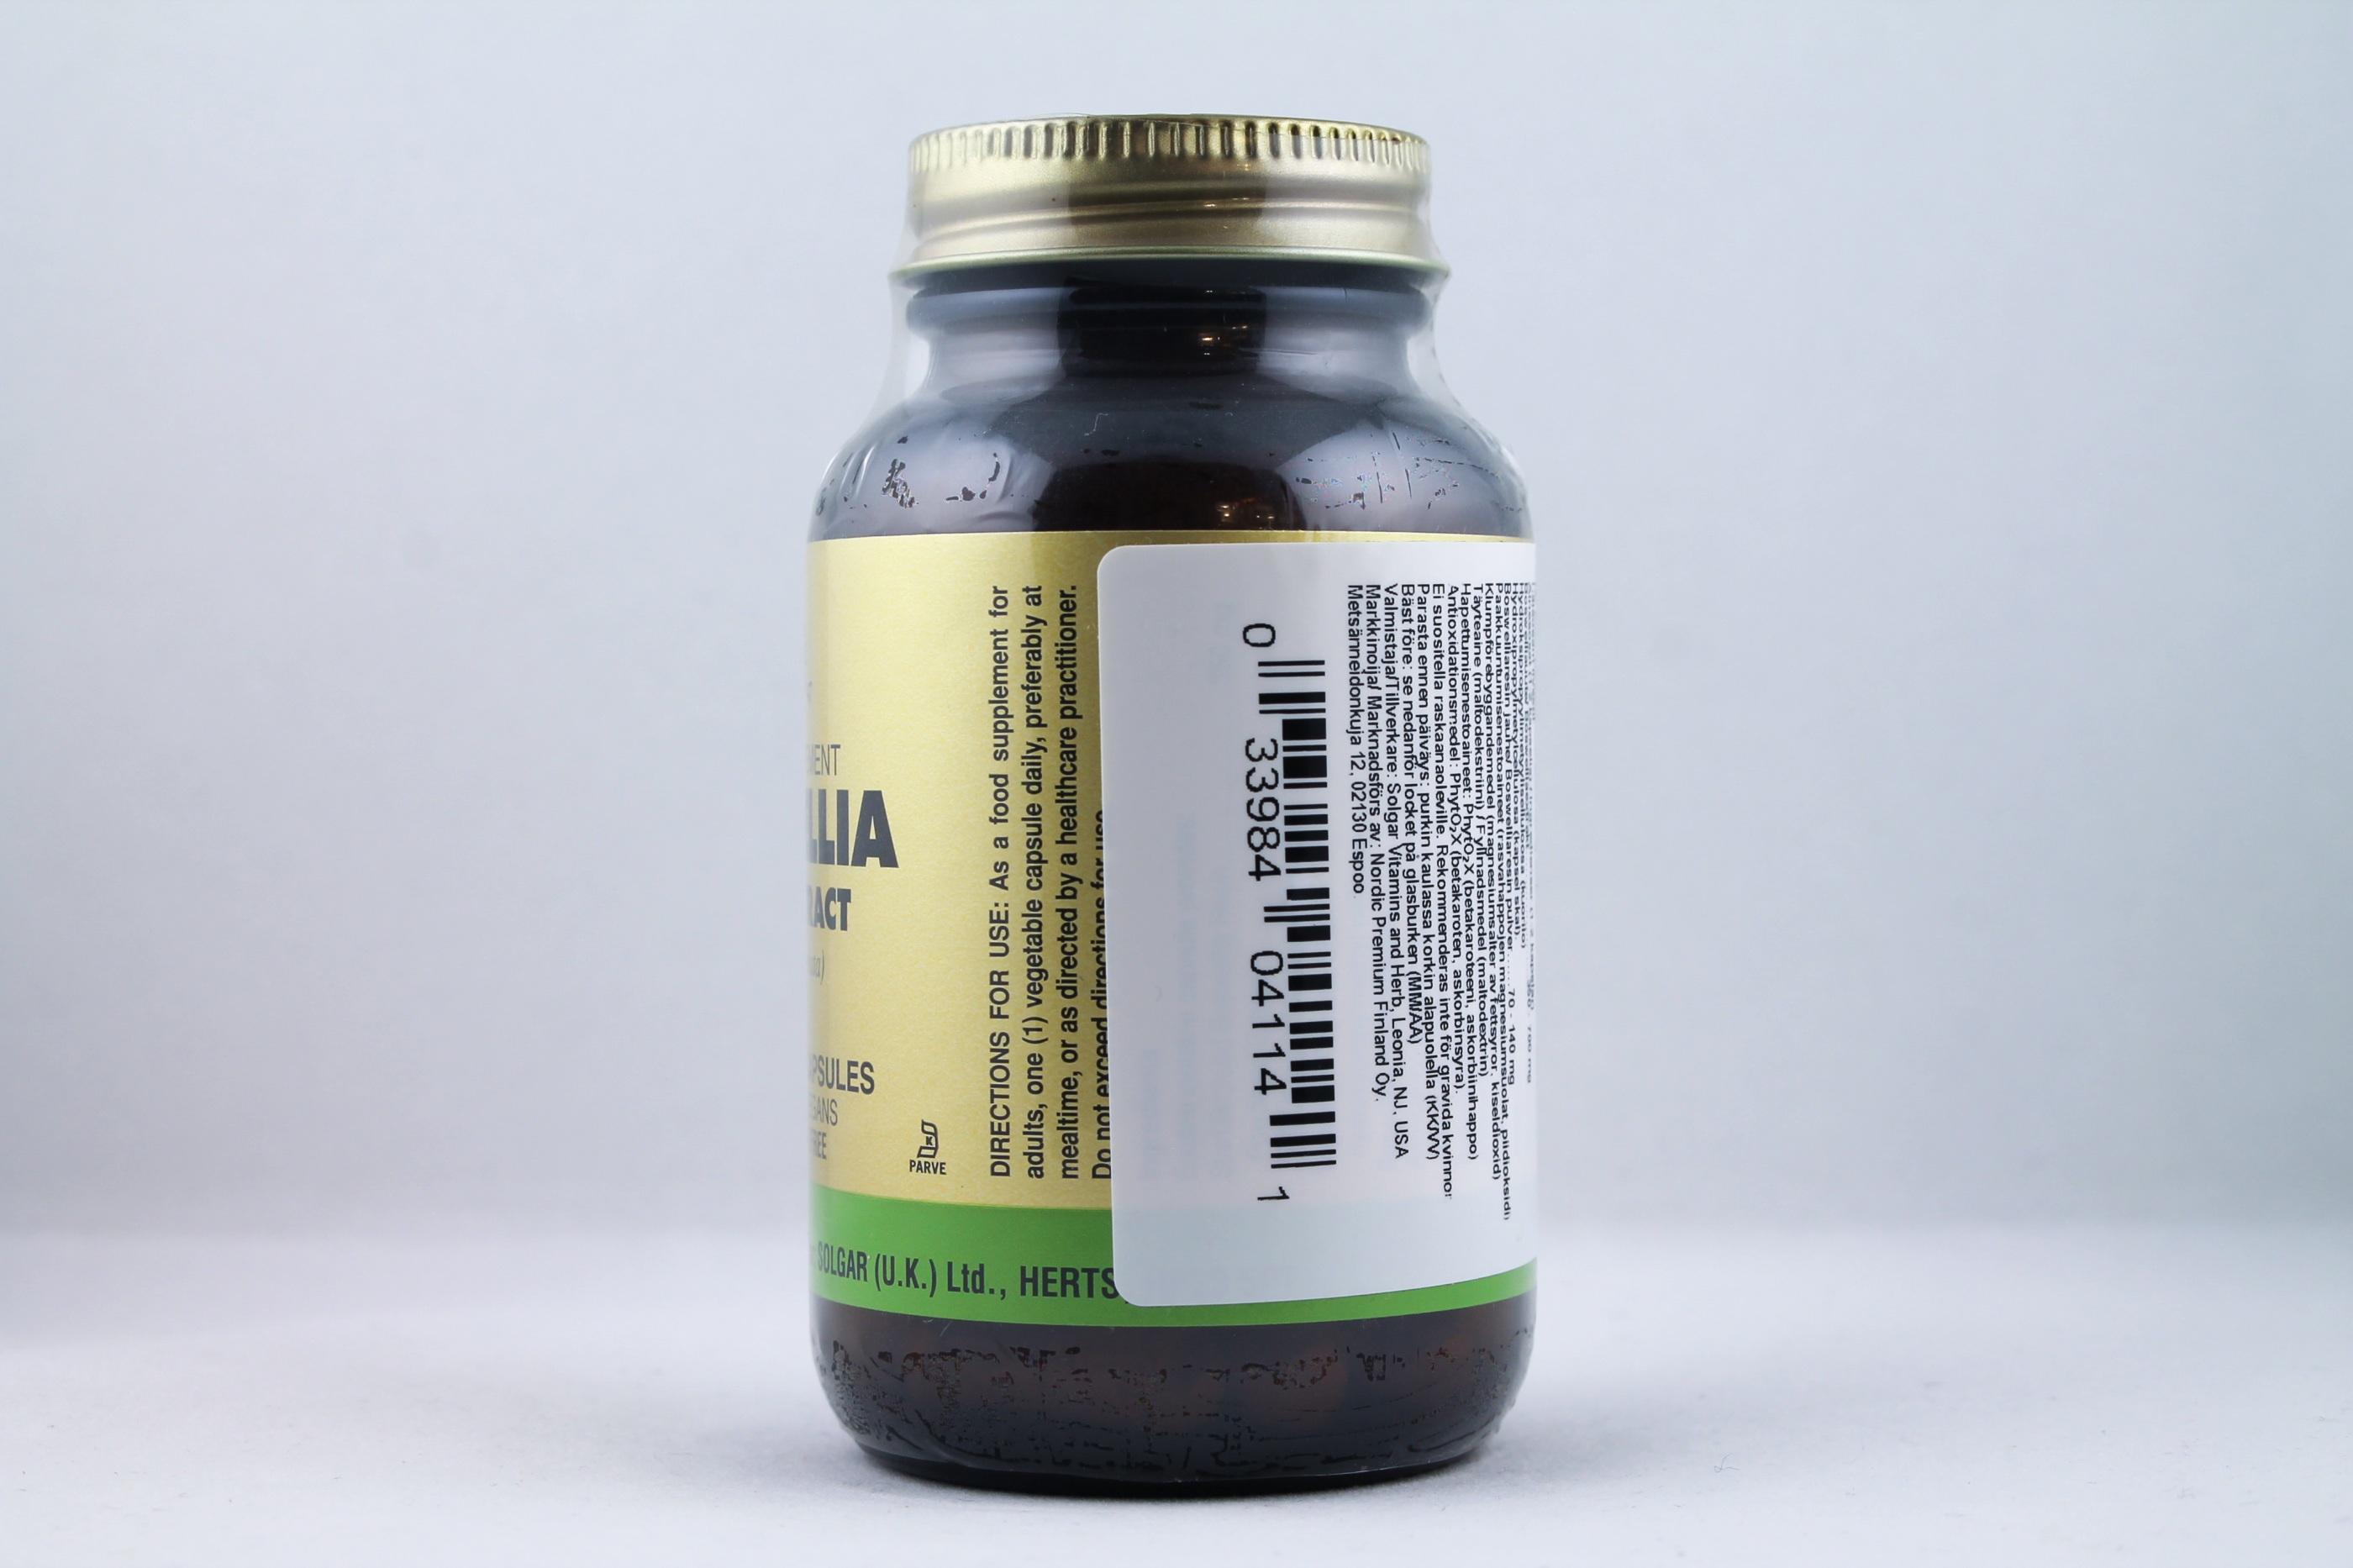 Boswellia Resin Extrakt Wellness Ayurveda Halmstadmassören Halmstad Sverige Sweden svensk tabletter